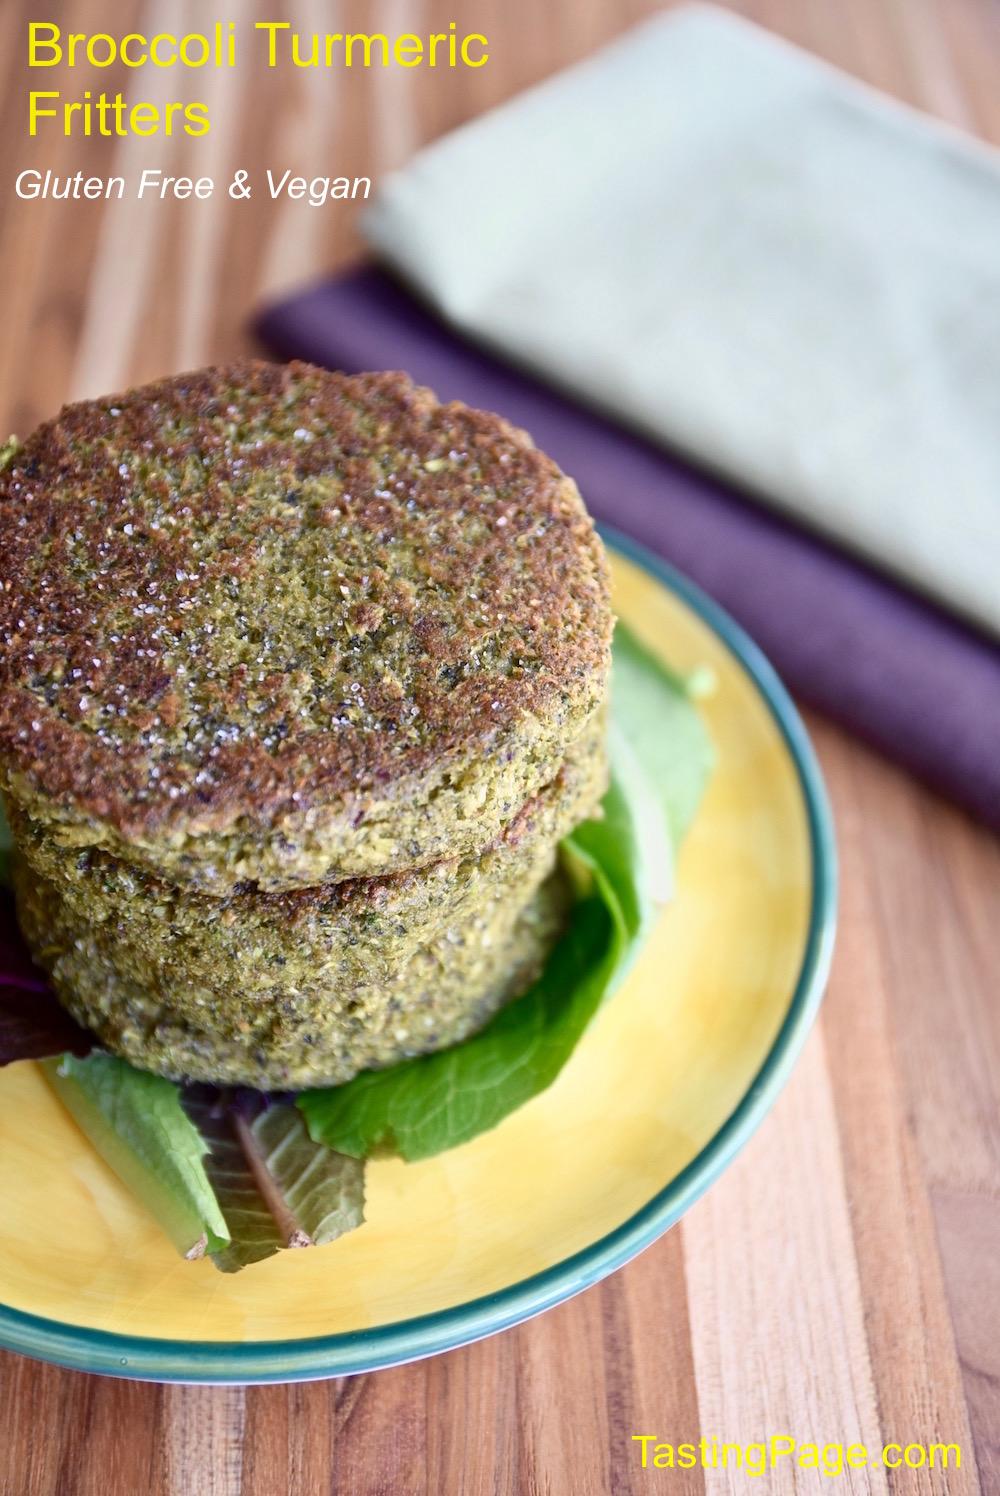 Broccoli Turmeric Fritter - gluten free and vegan   TastingPage.com